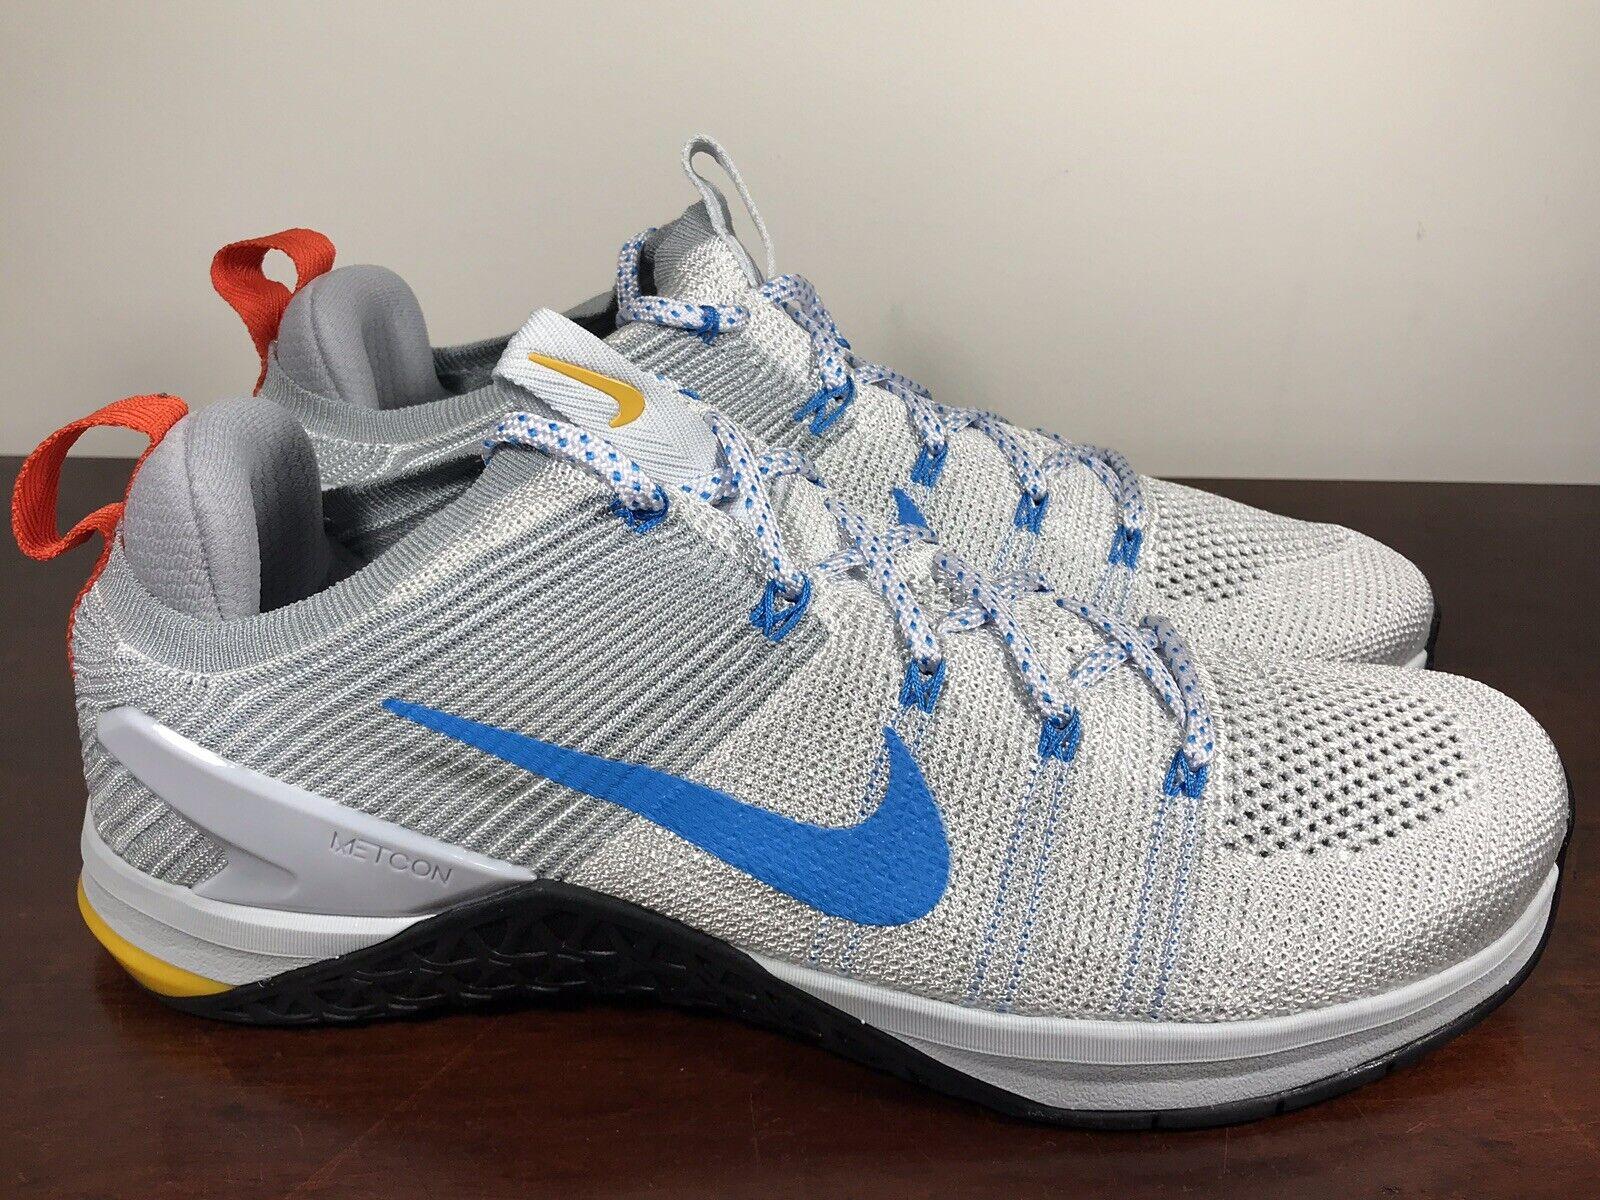 Men's Nike Metcon DSX Flyknit 2 White blueee Pure Platinum 924423-140 SZ 9.5 RARE